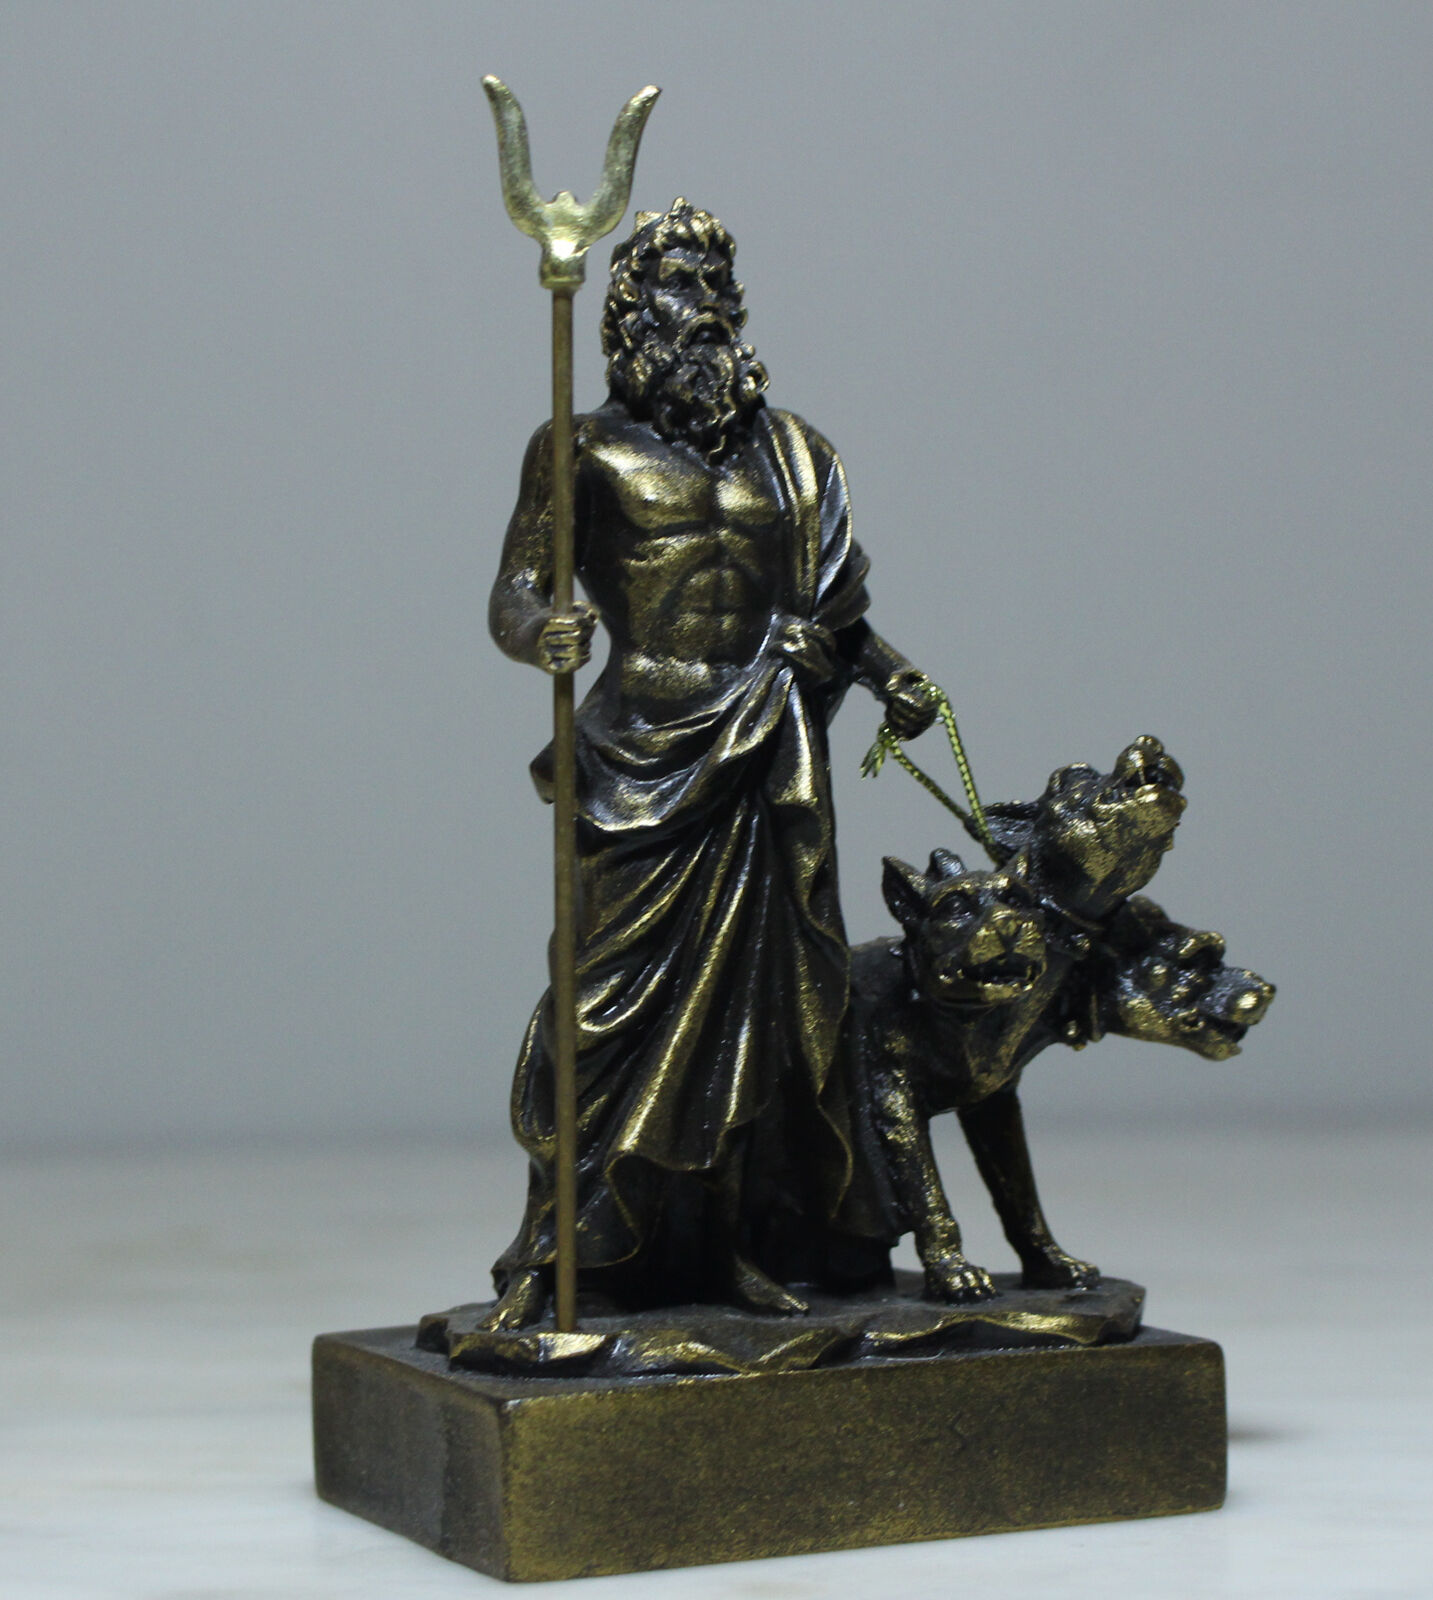 pluto roman god statue 61754 usbdata